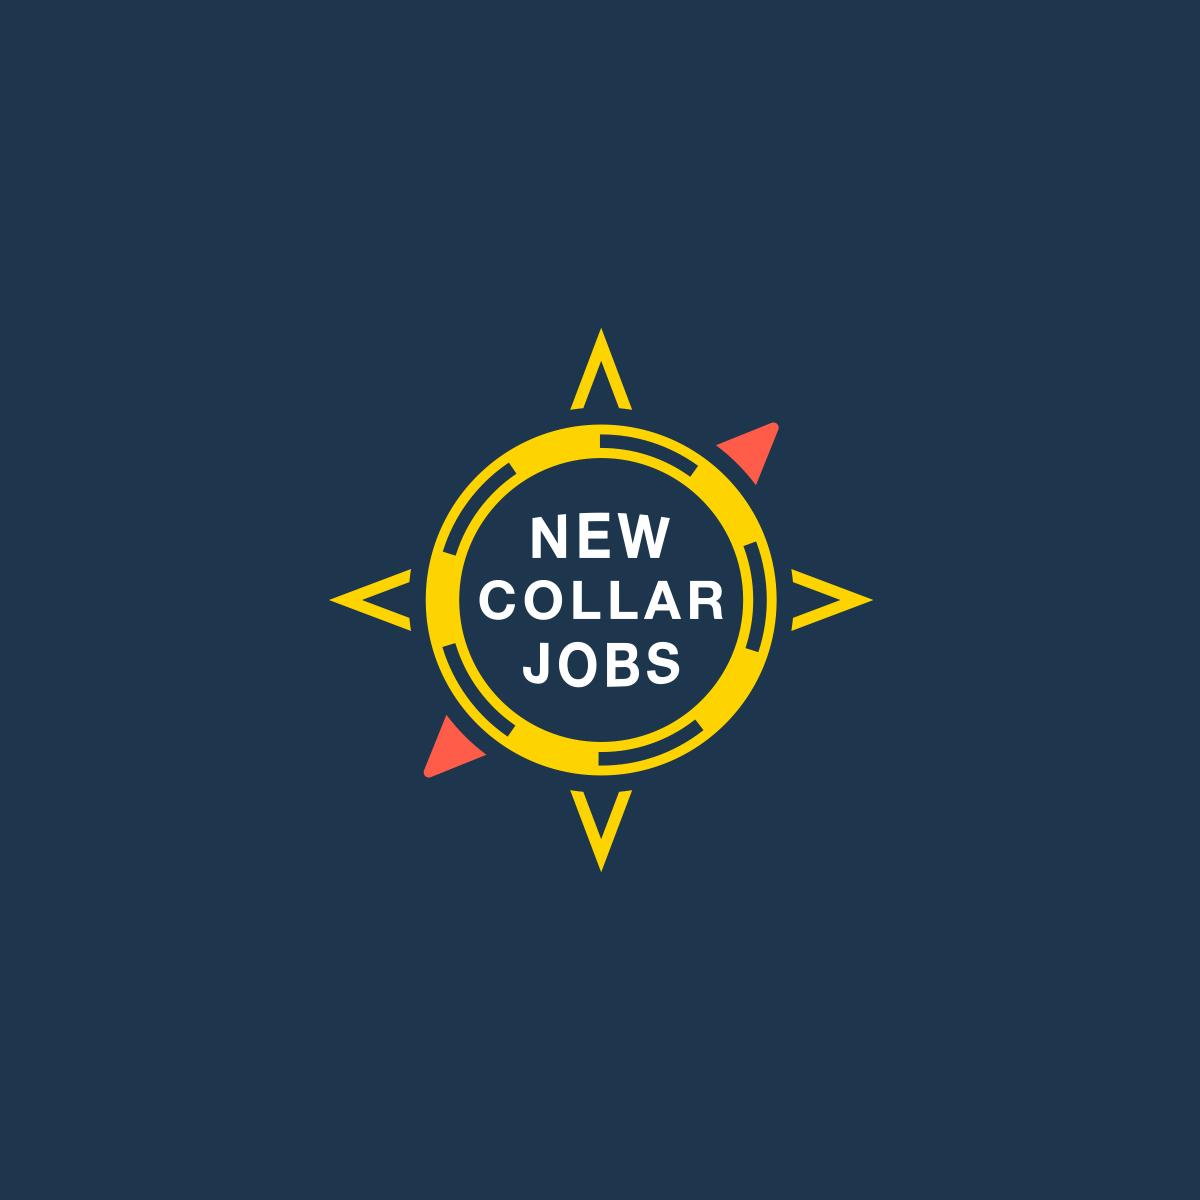 jk_misc_logo_square_new_collar